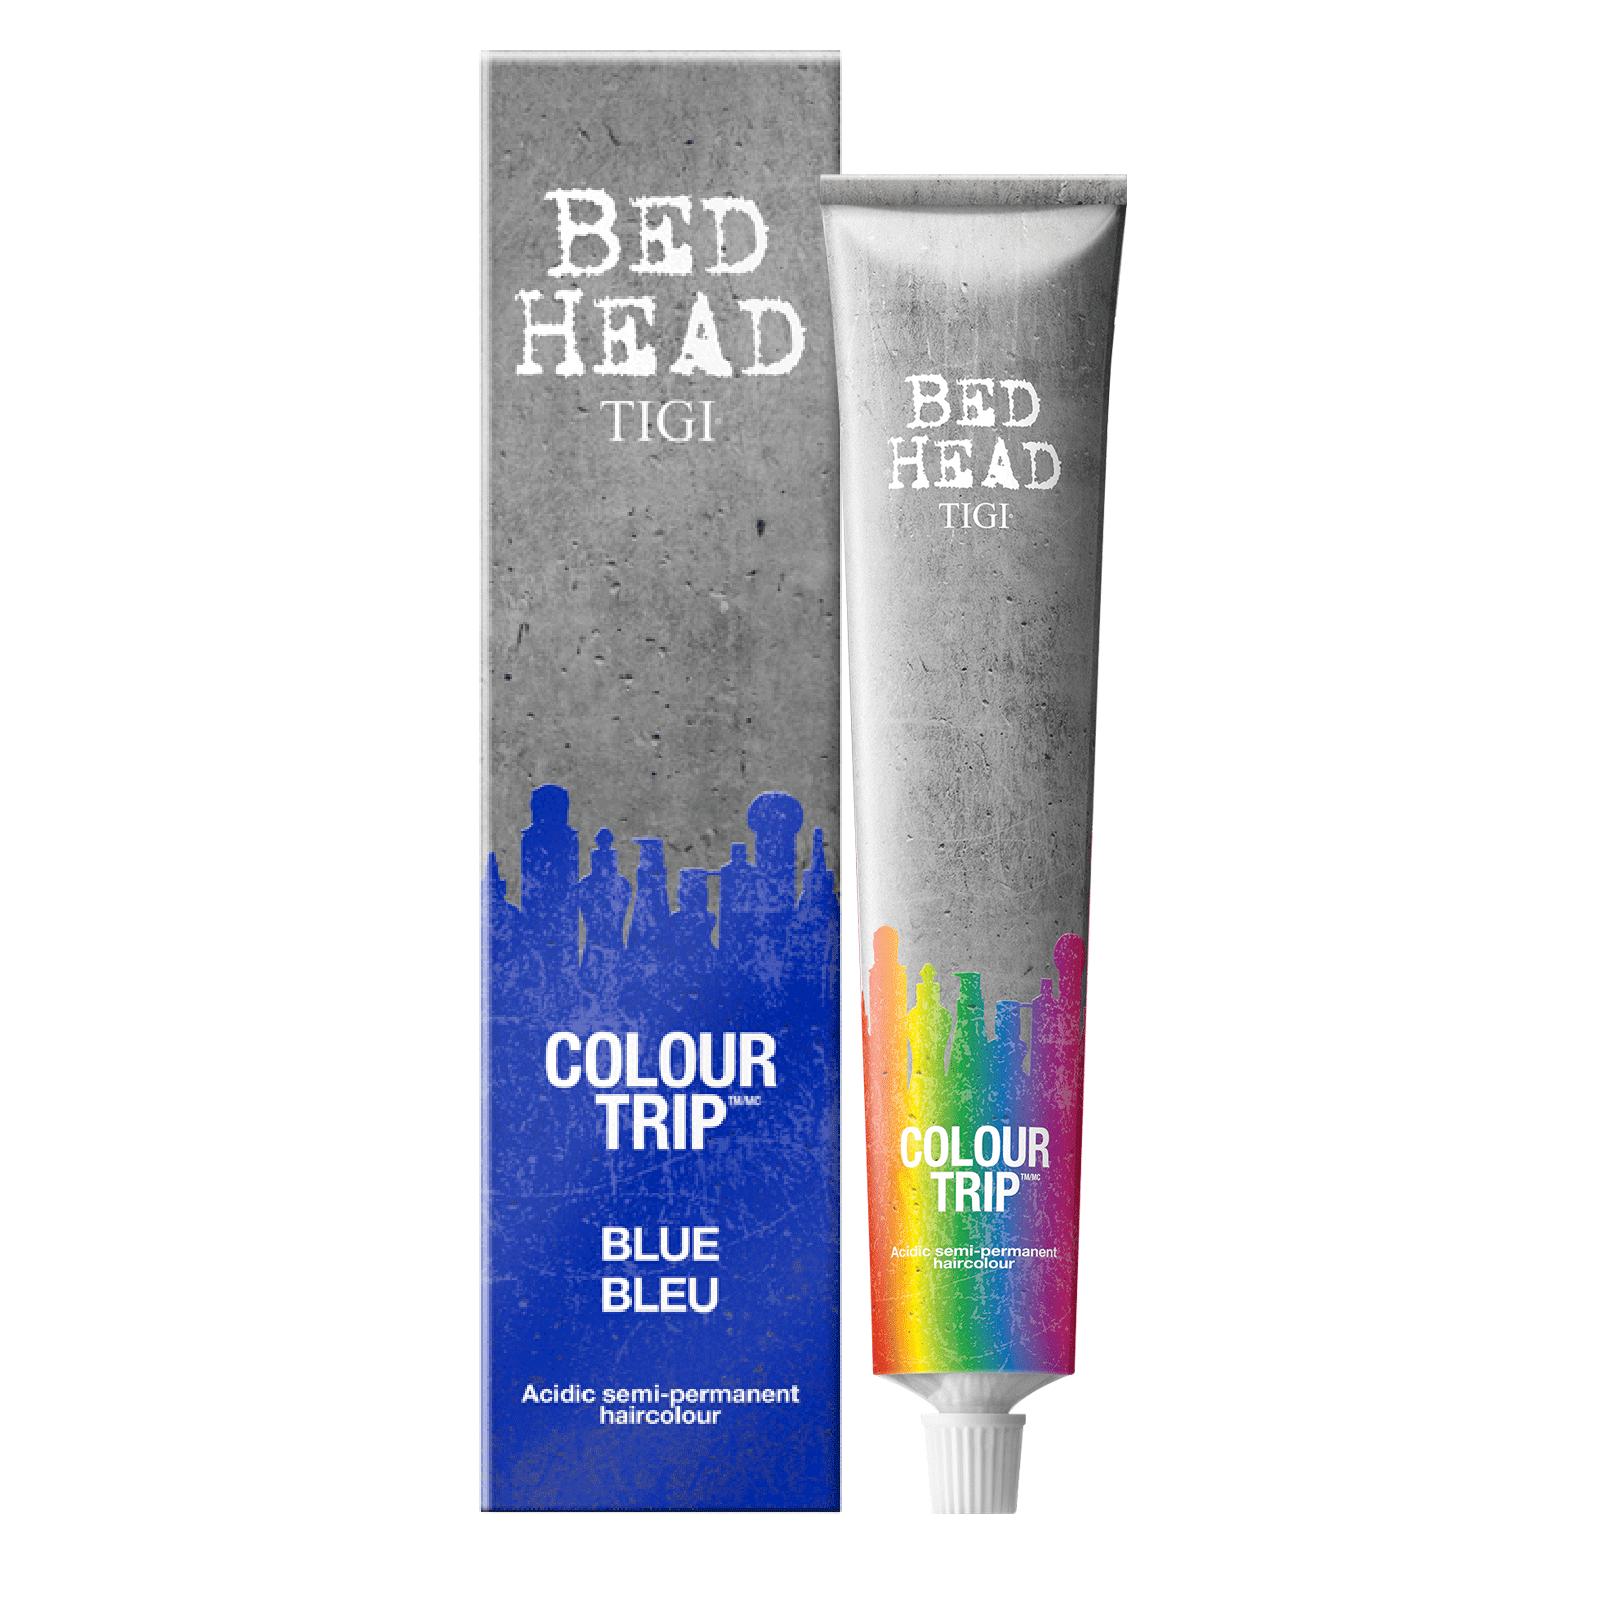 Bed head colour trip semi permanent shades tigi cosmoprof bed head colour trip semi permanent shades nvjuhfo Choice Image